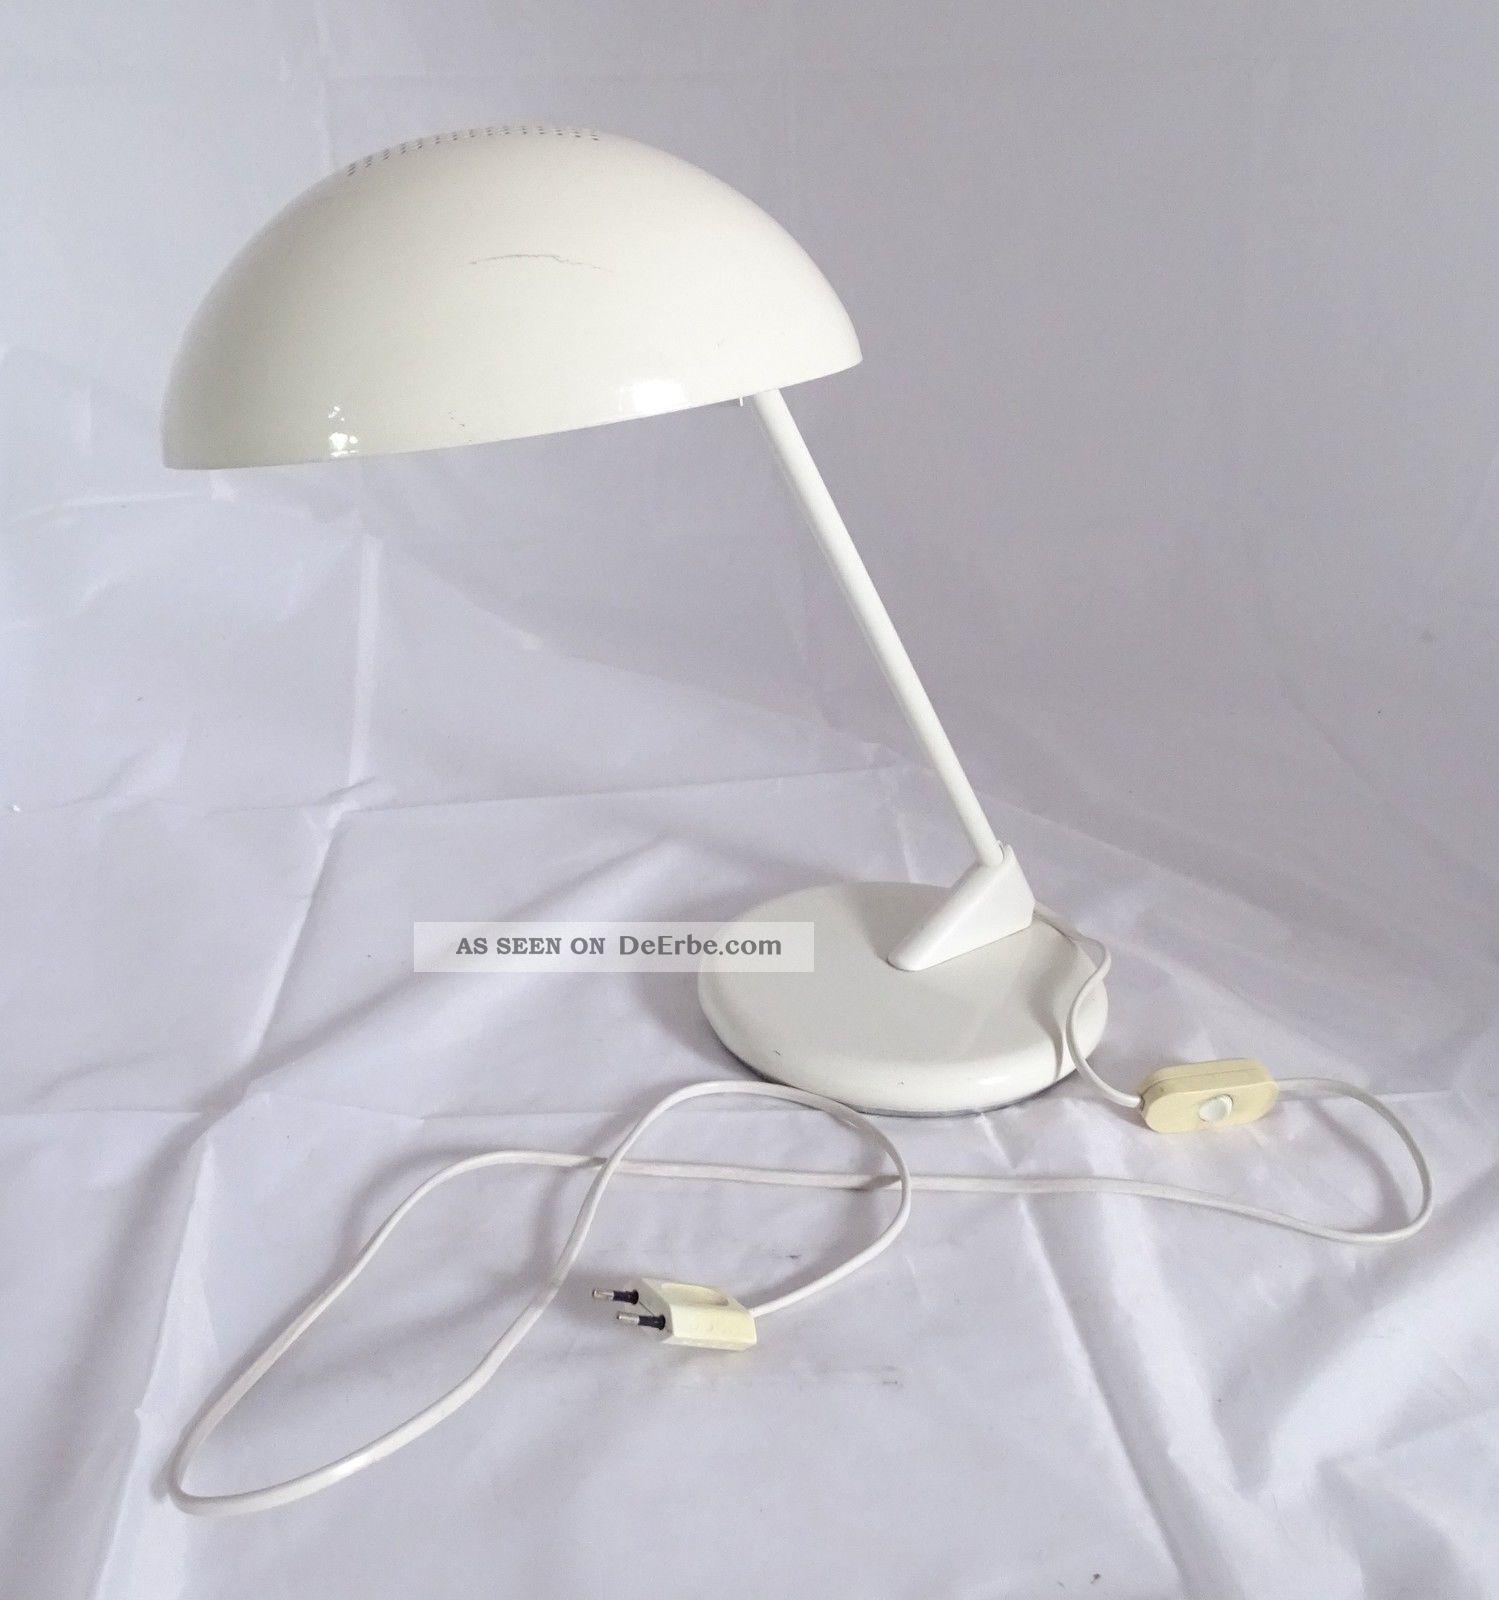 Vintage Panton Ära Shabby Chic Seneca Italian Design Tisch Lampe 1970-1979 Bild